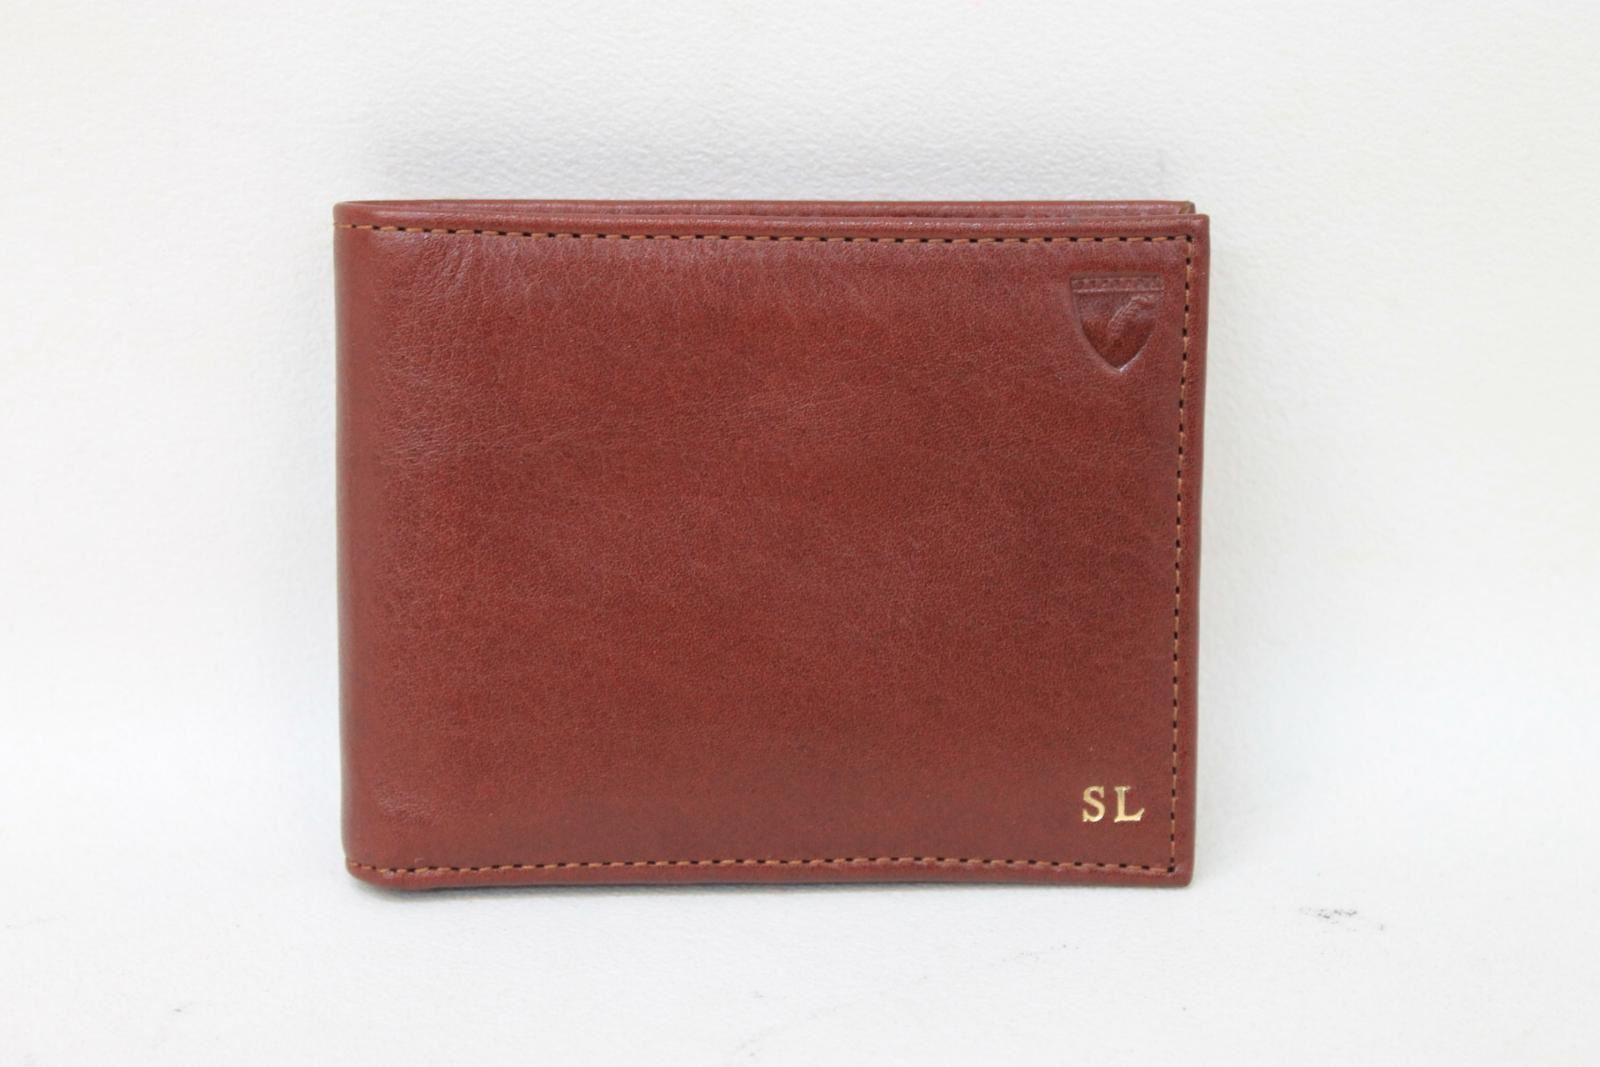 NWOT-ASPINAL-OF-LONDON-Men-039-s-Cognac-Smooth-Leather-Bifold-Wallet-Card-Holder